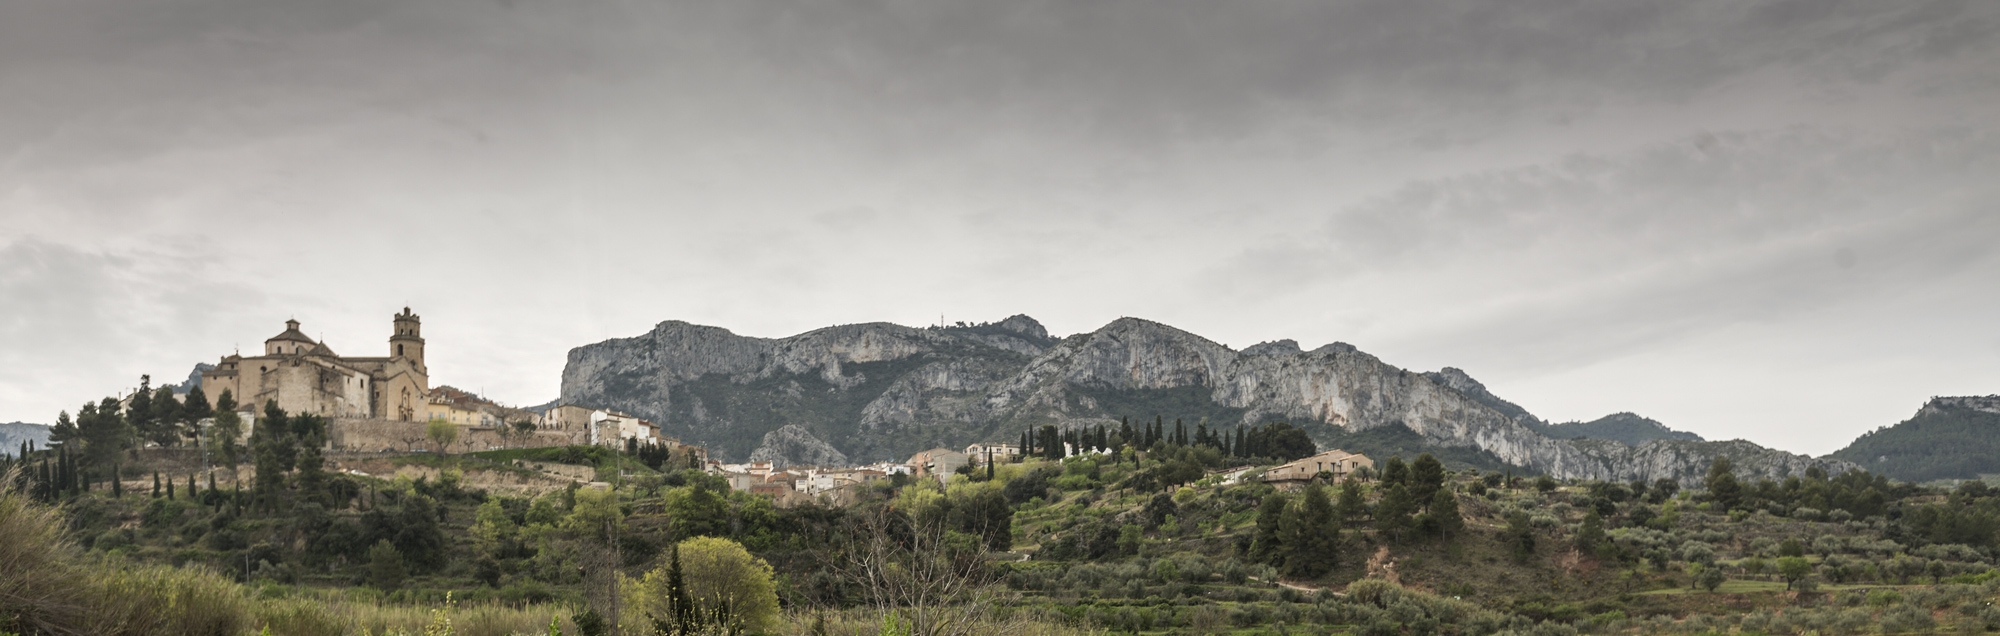 Vistes poble de Tivissa